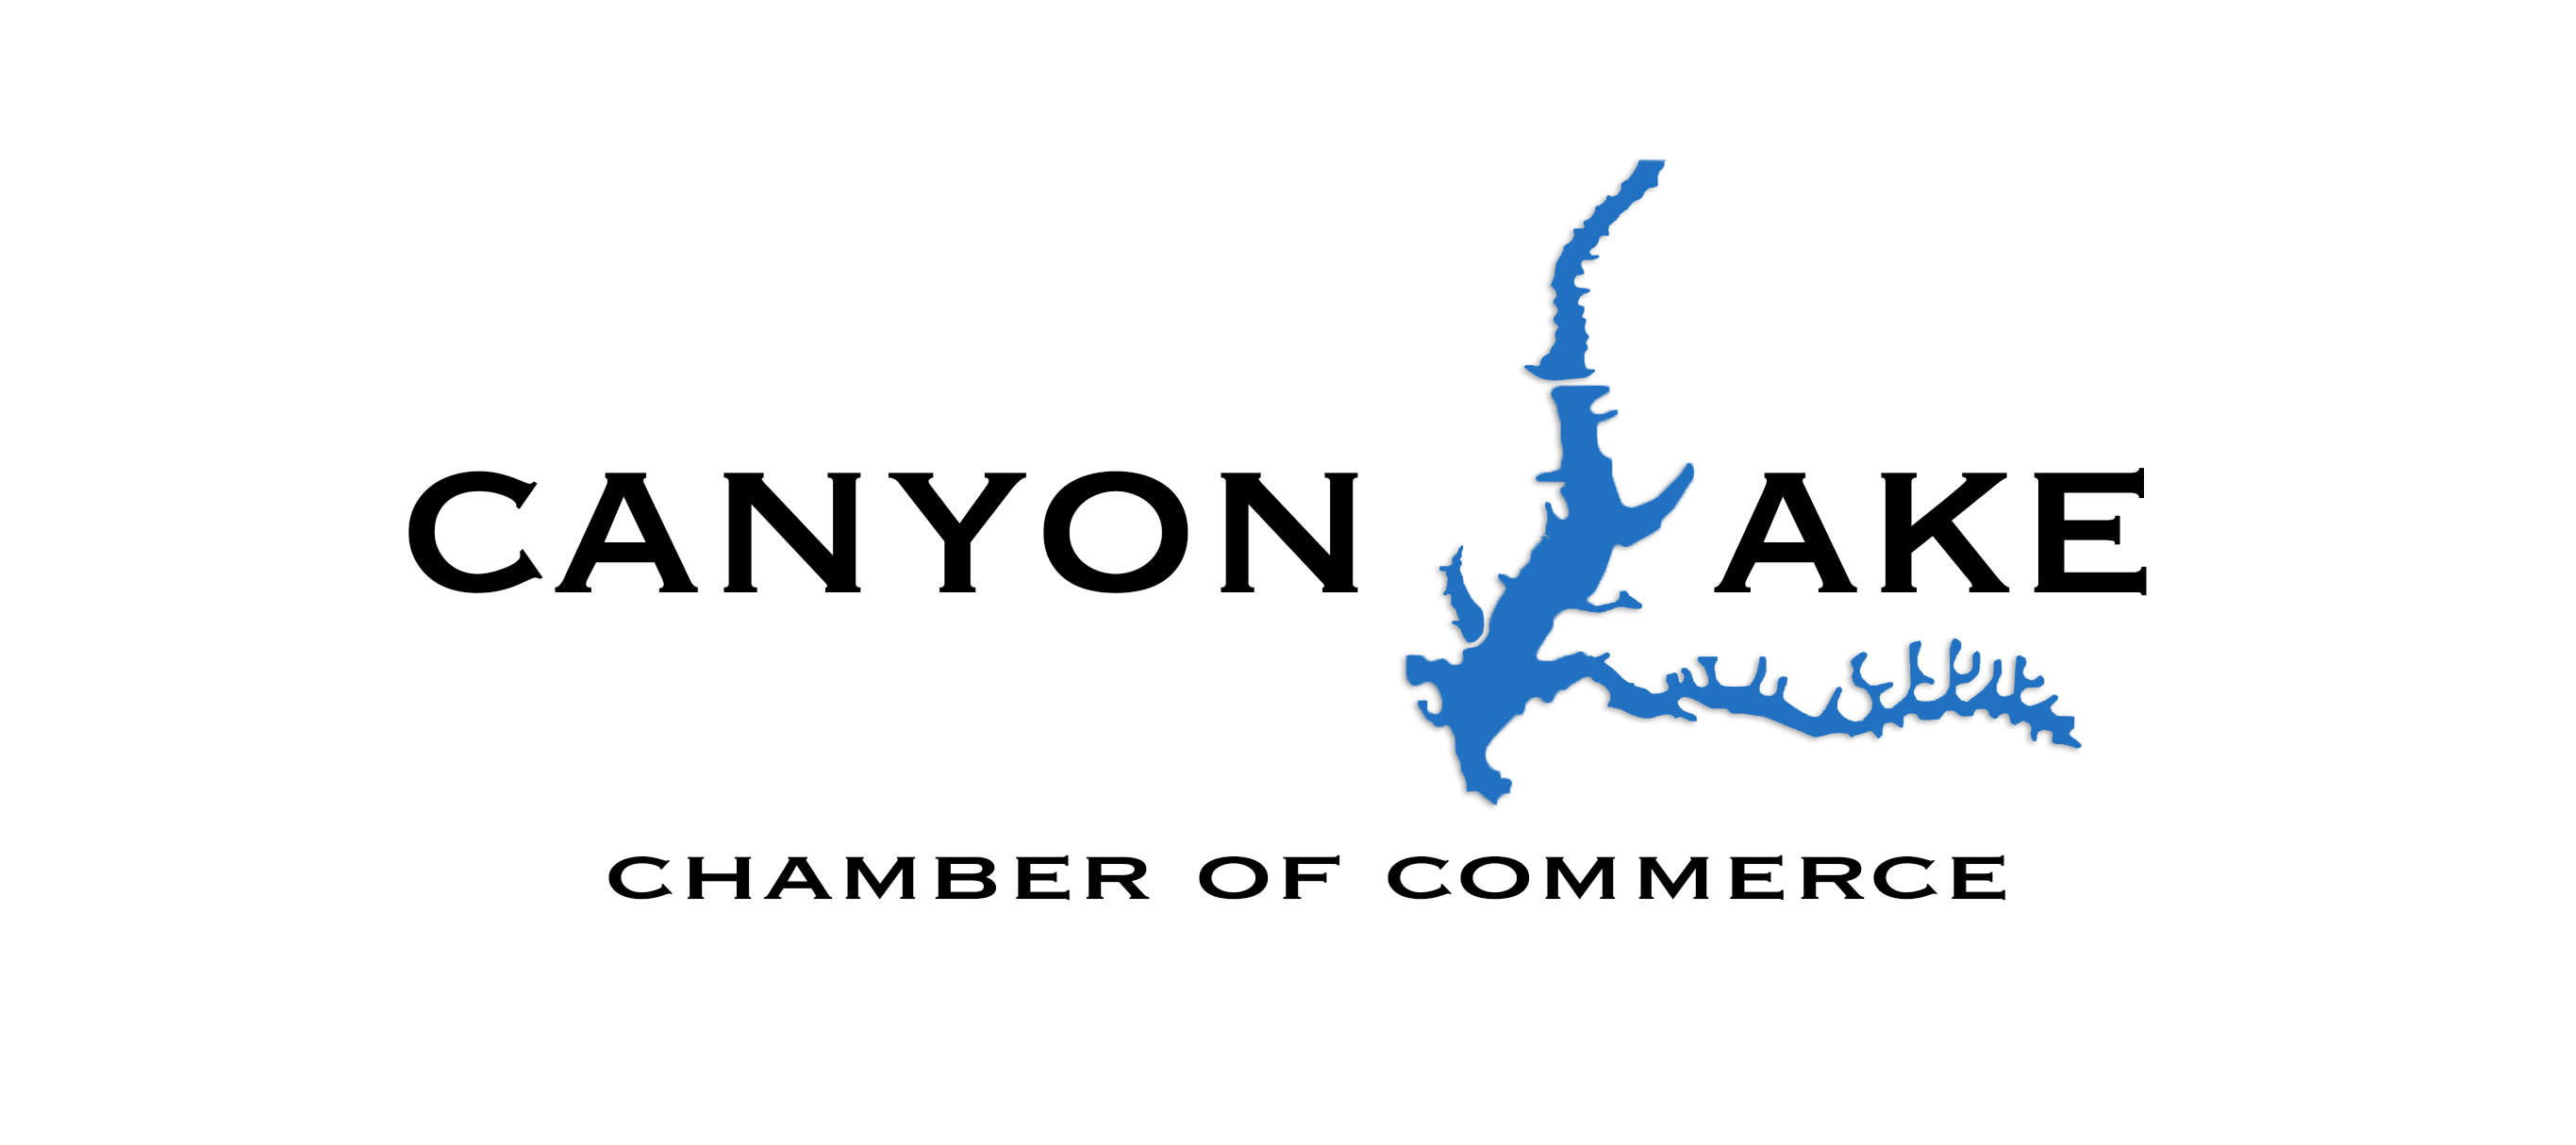 Canyon Lake Chamber of Commerce